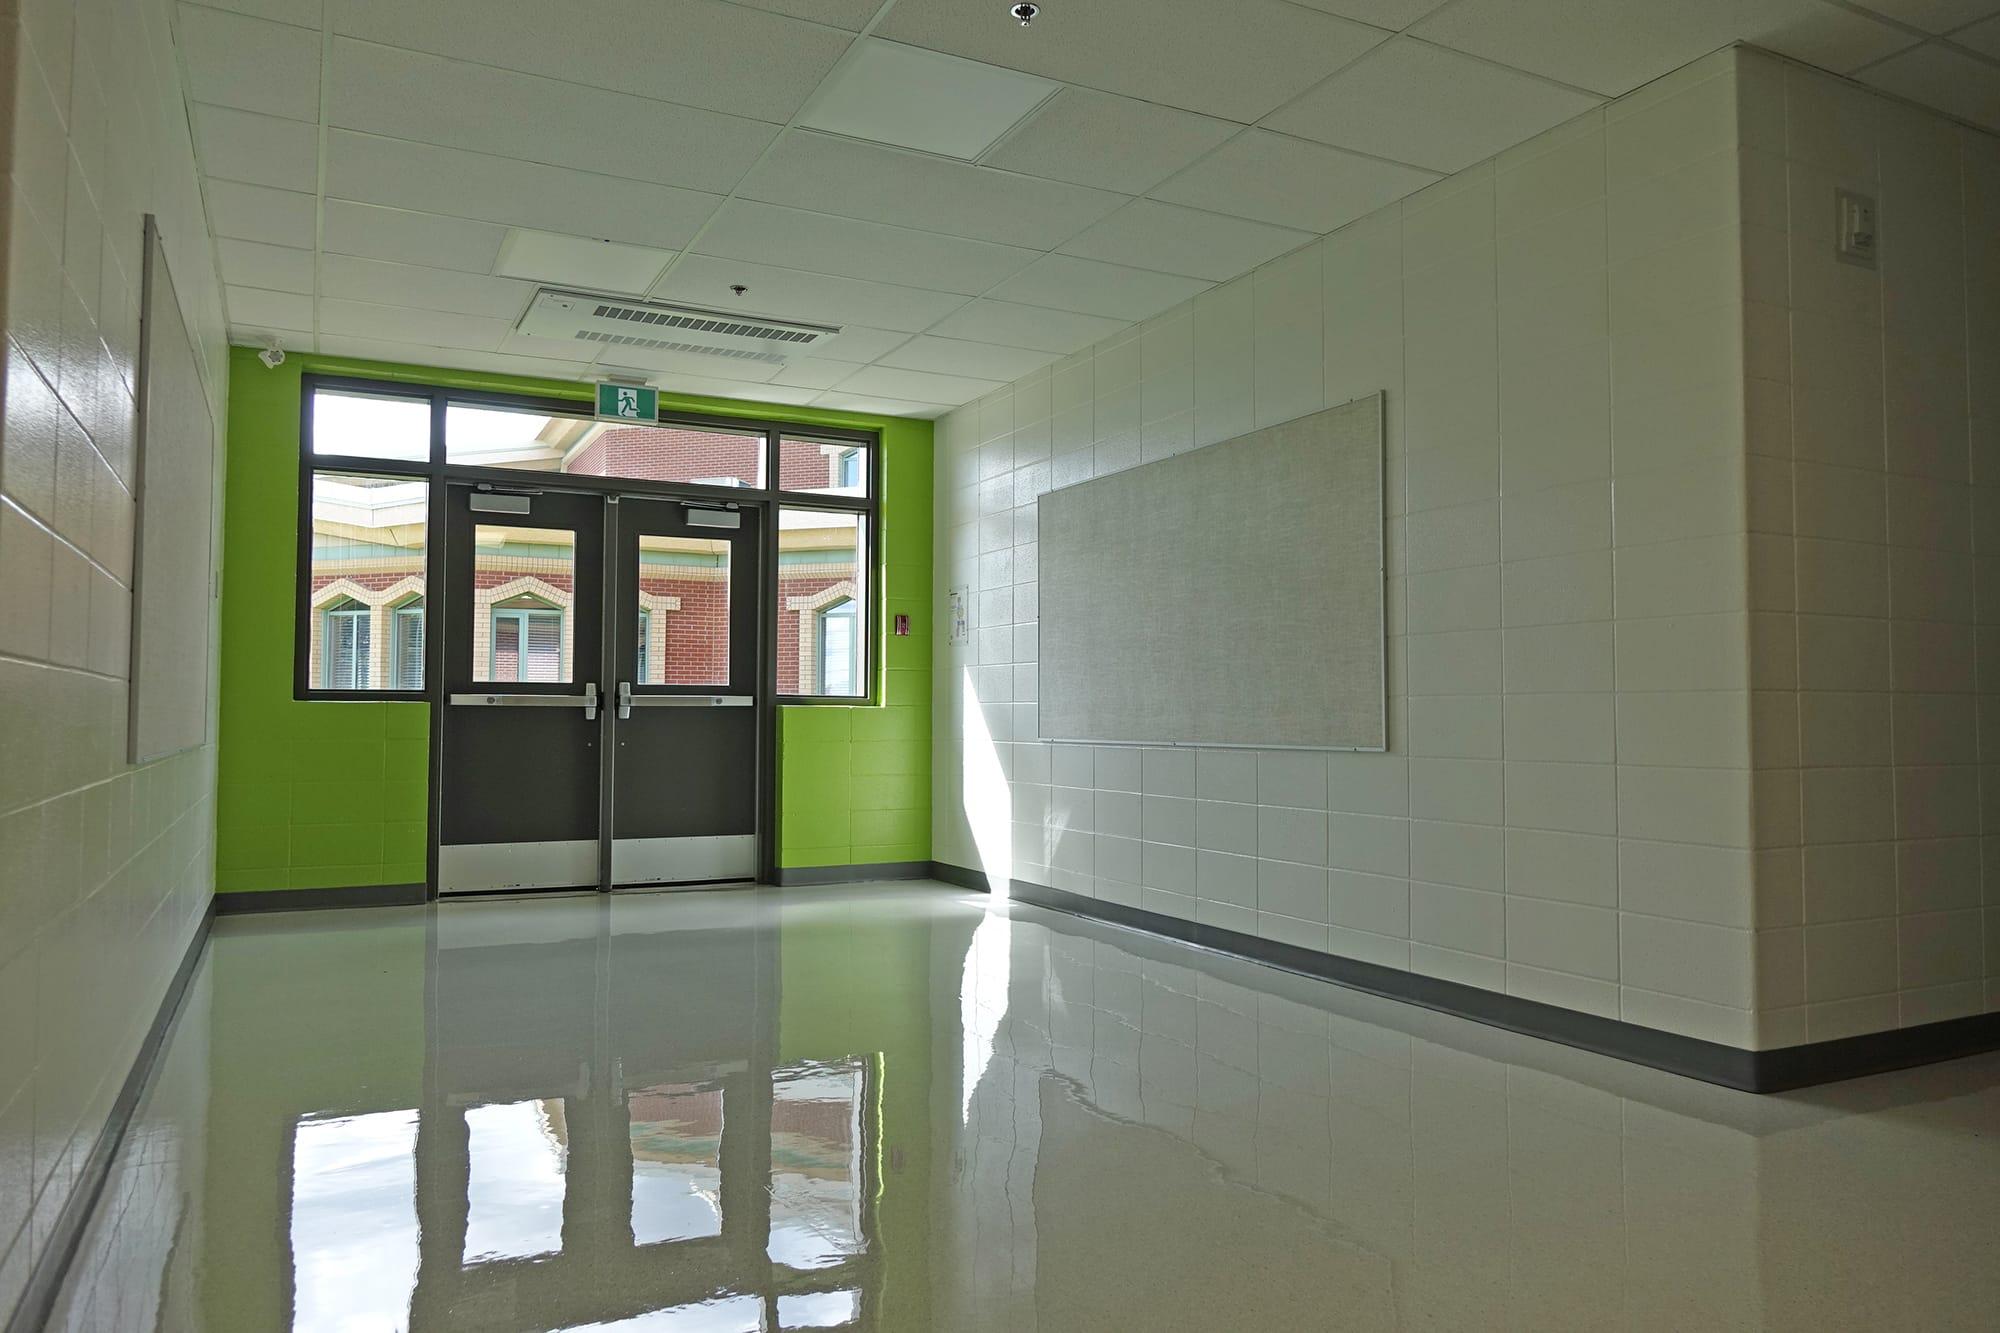 École Montrose Junior High School interior hallway